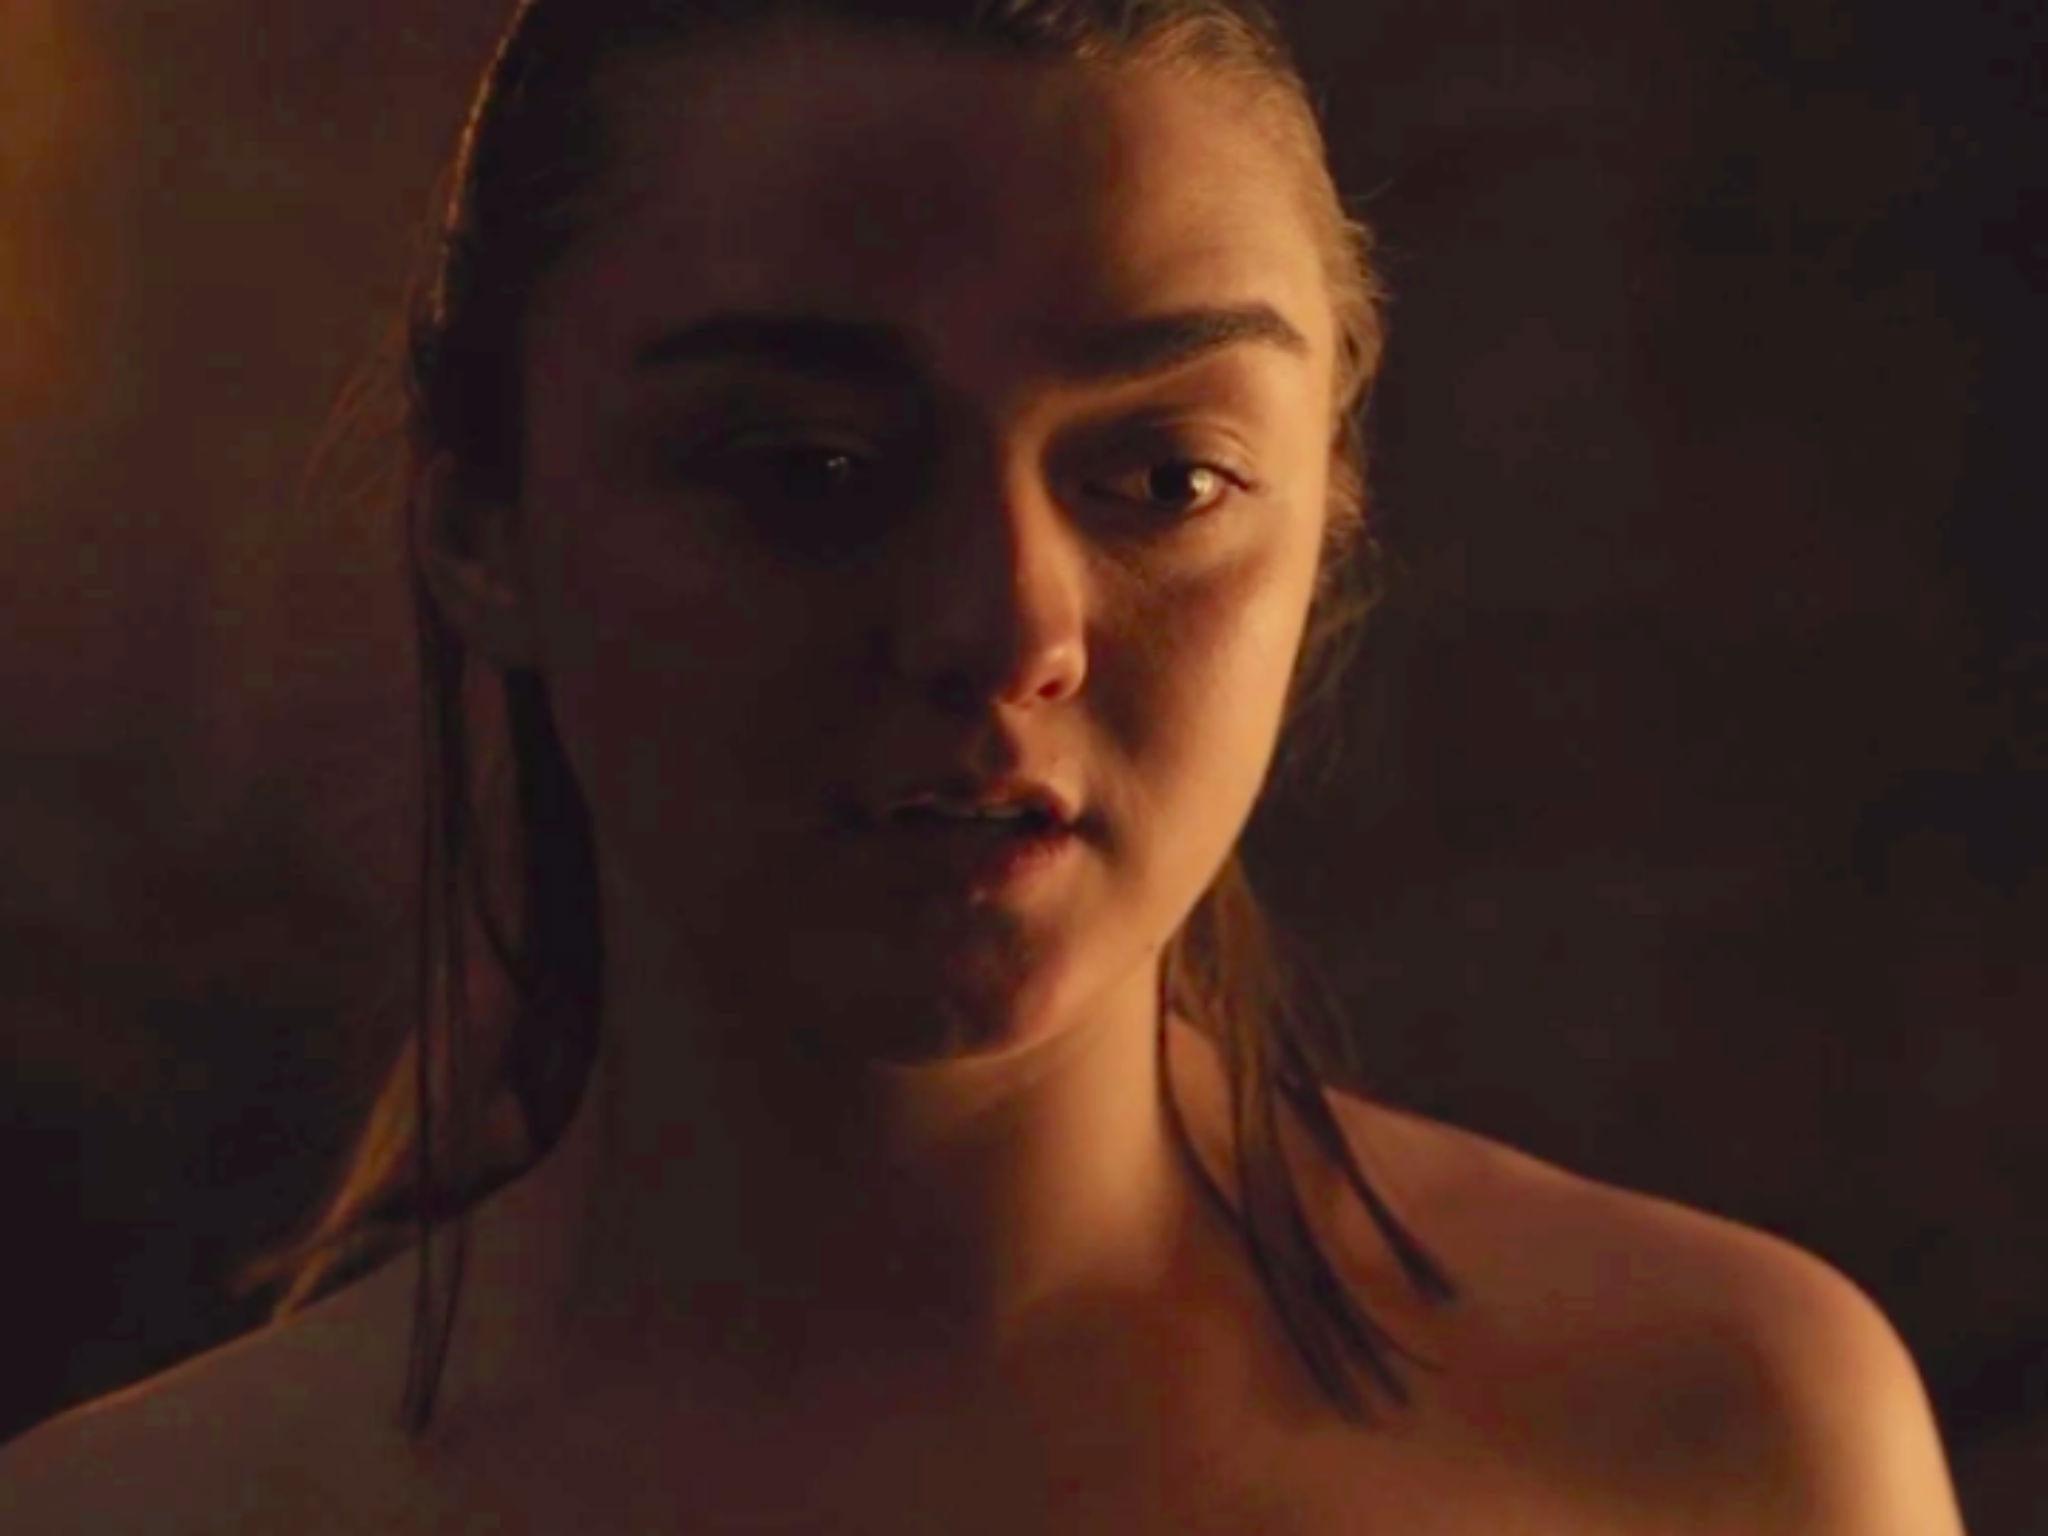 Game of thrones sexiest scenes